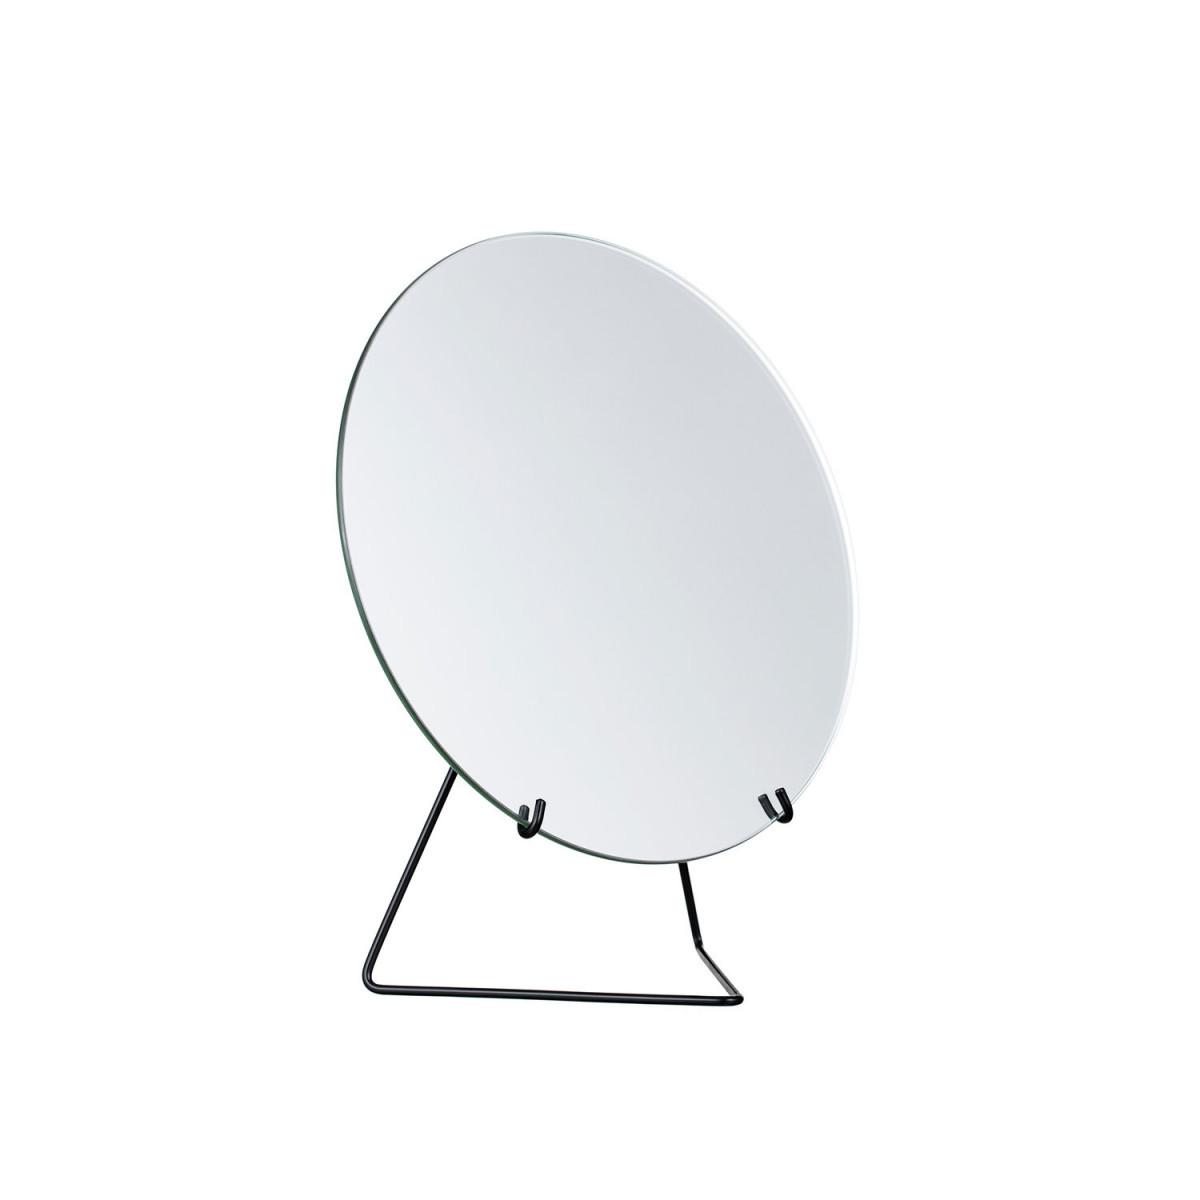 Настольное зеркало Mirror